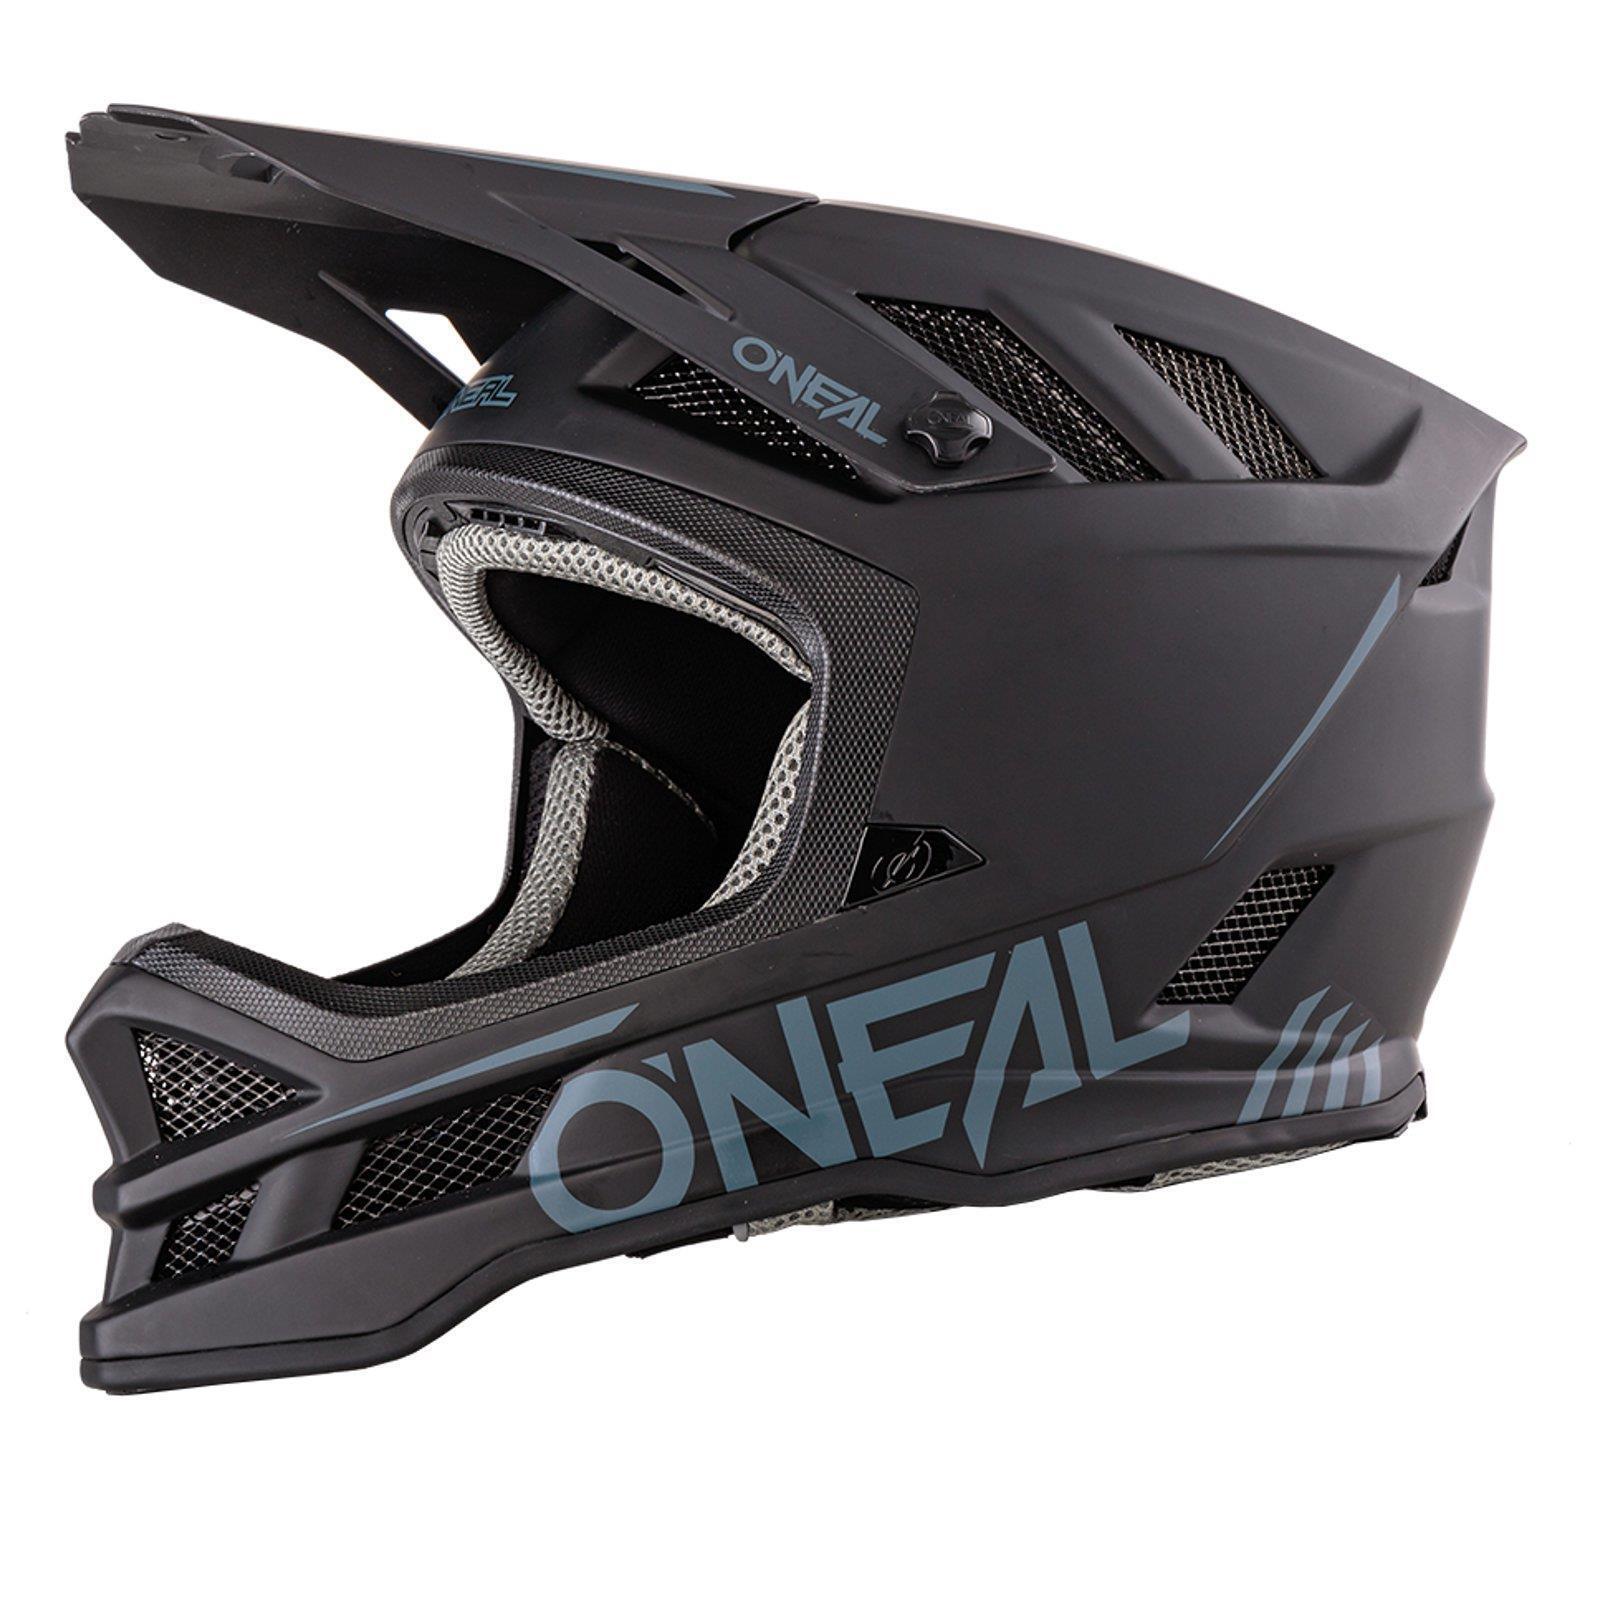 ONeal Blade Solid black Helm All Mountain Bike Enduro MTB Downhill DH Fahrrad